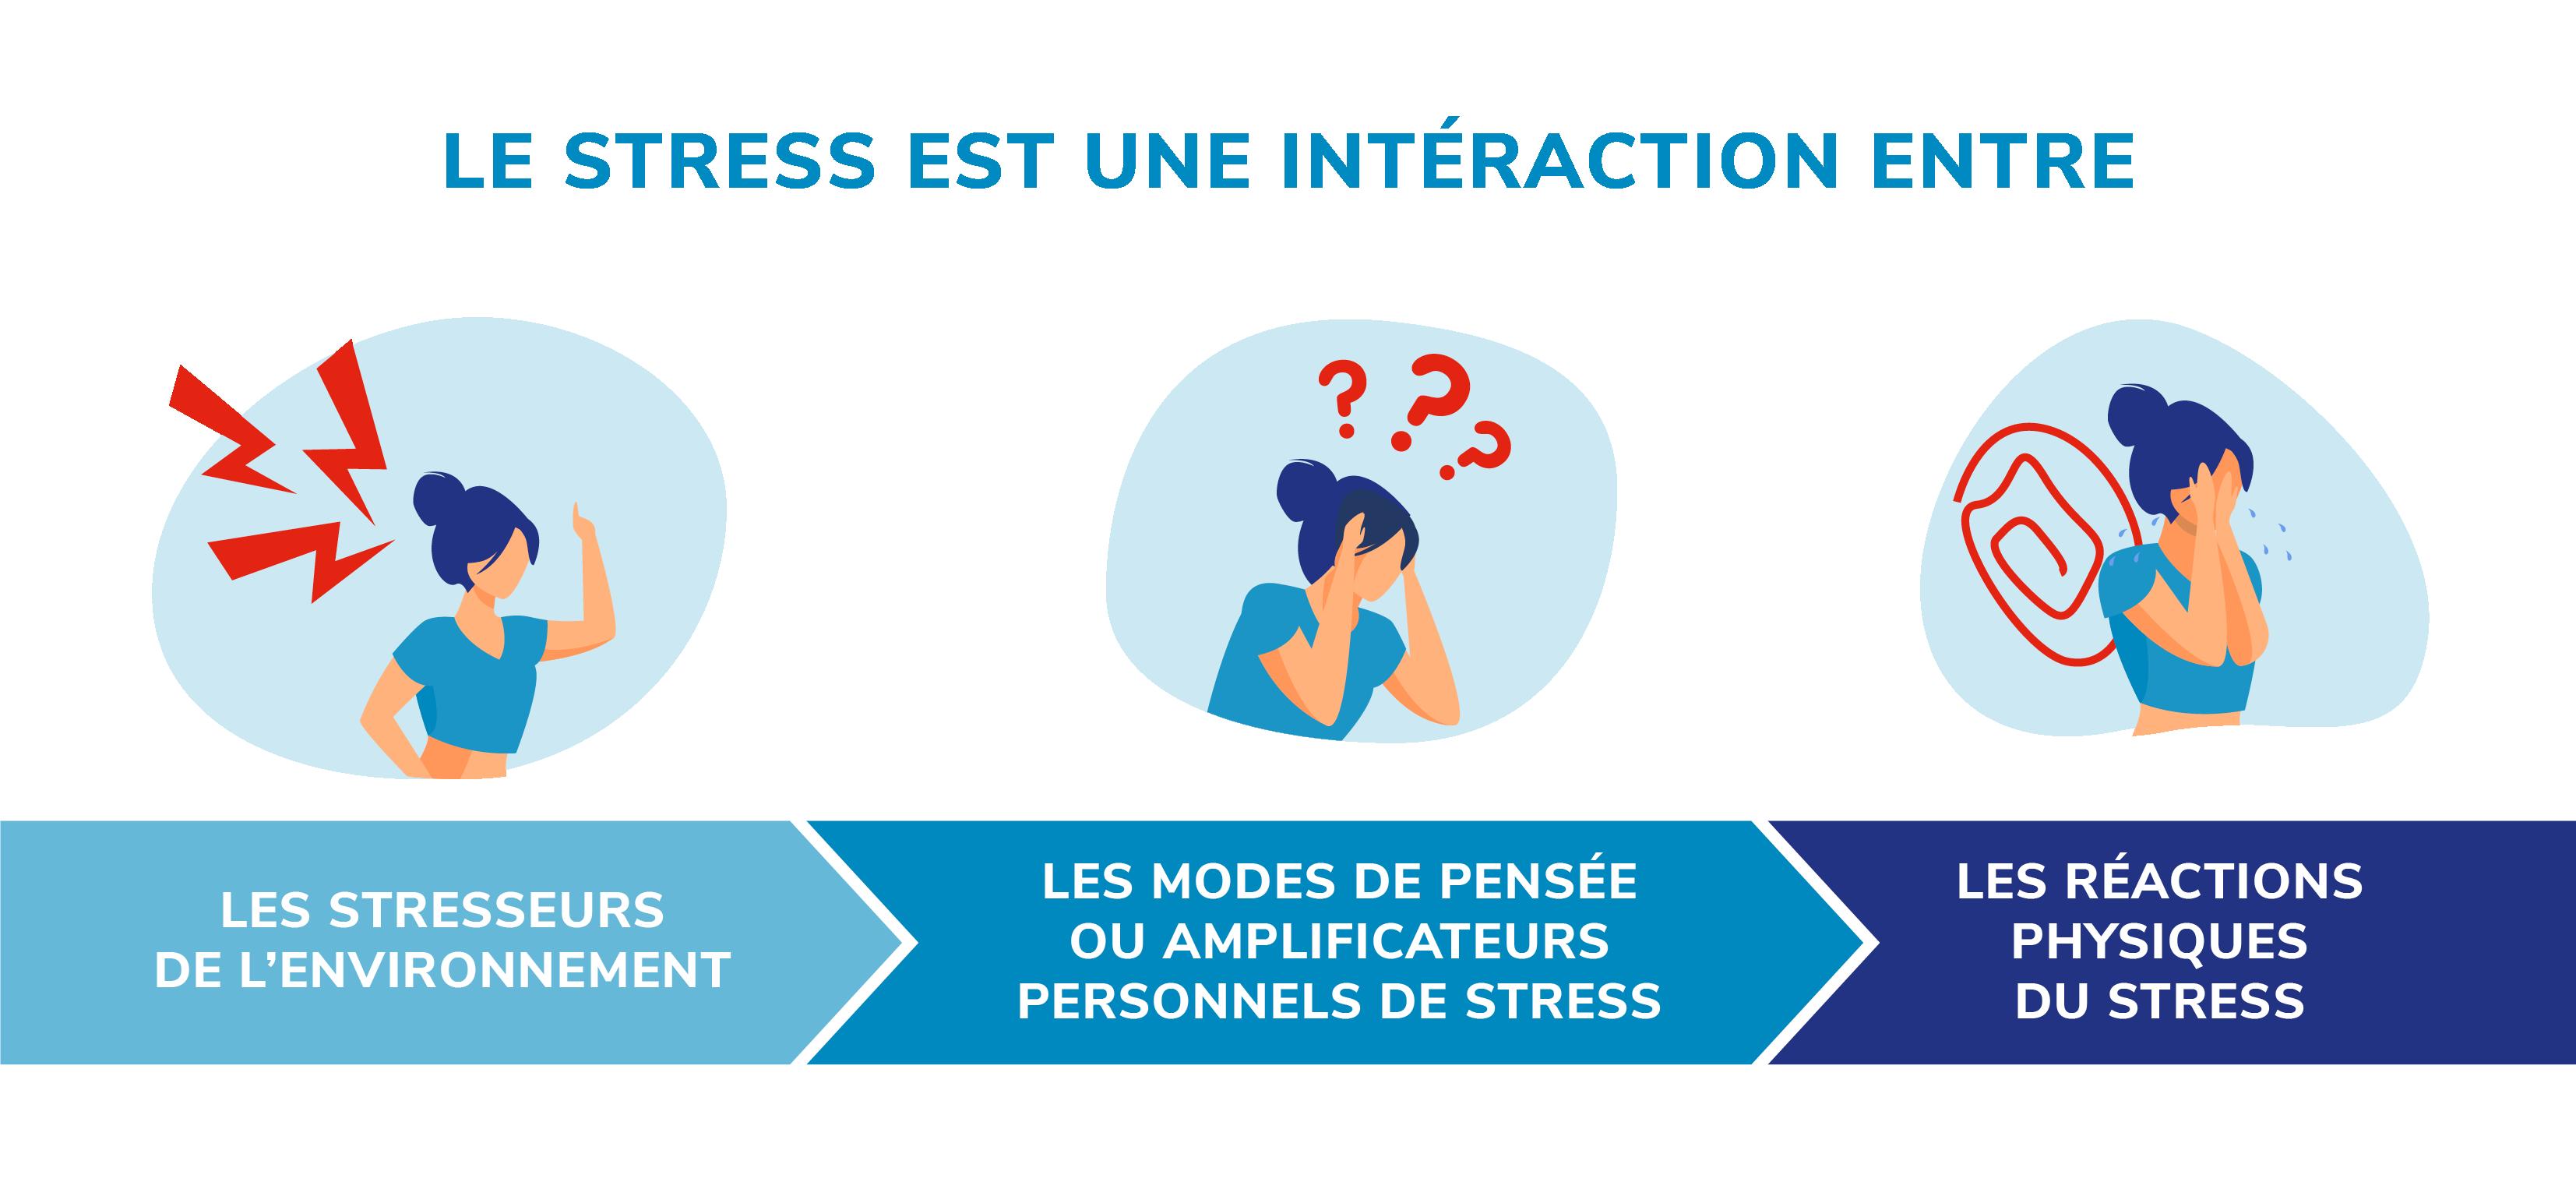 stress interaction